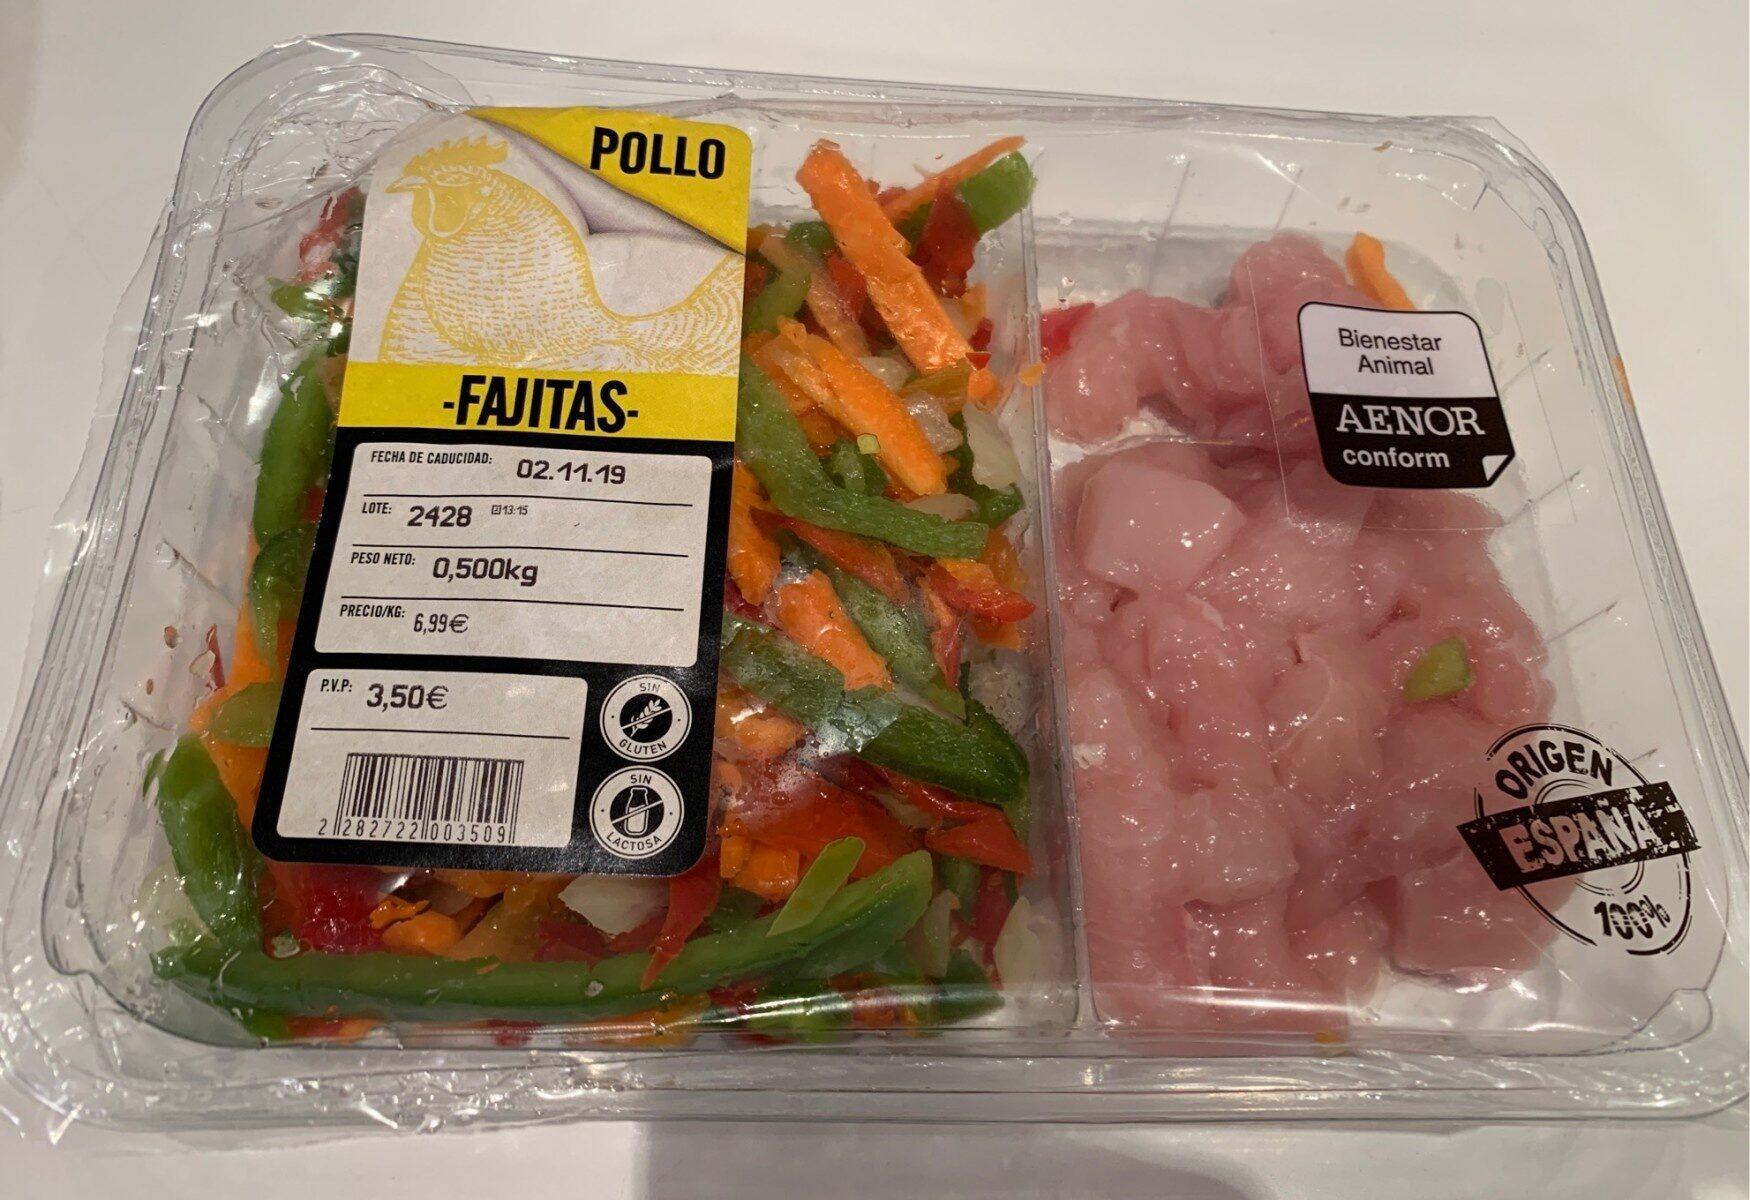 Pollo fajitas - Product - es